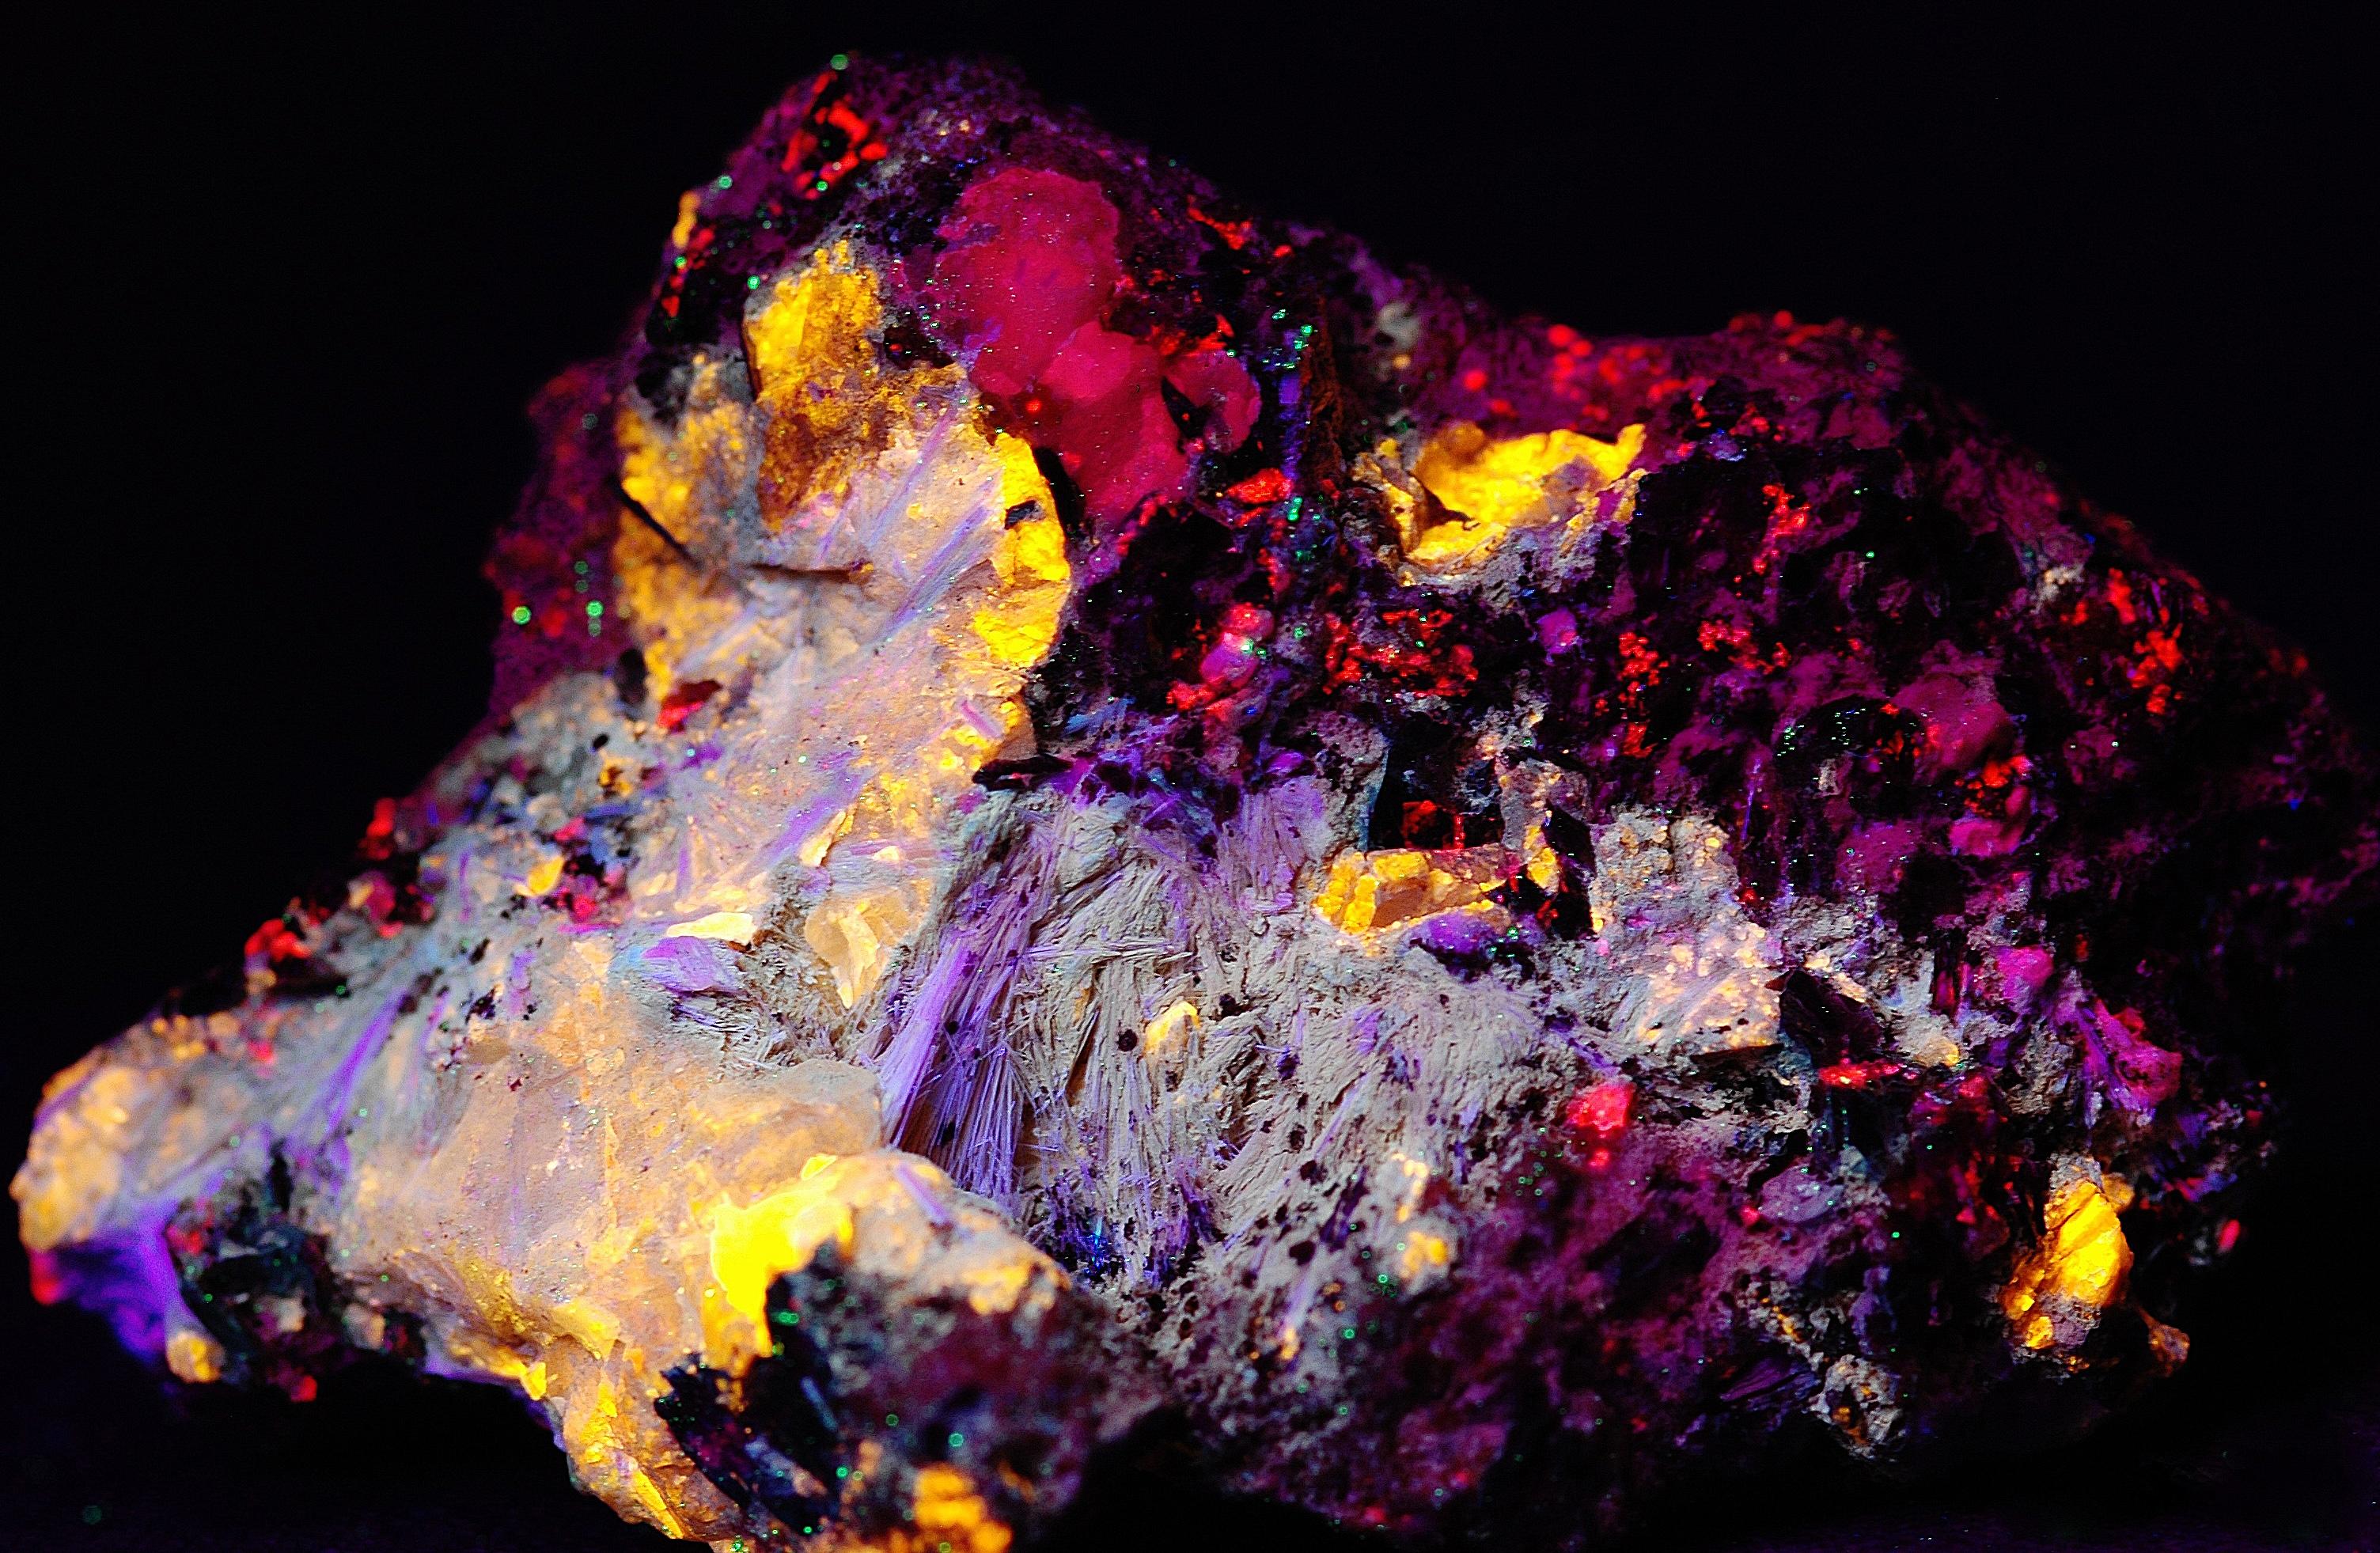 Xonotlite crystals, roeblingite, amethystine clinohedrite, feldspar and hendricksite mica from Franklin, NJ under shortwave UV Light